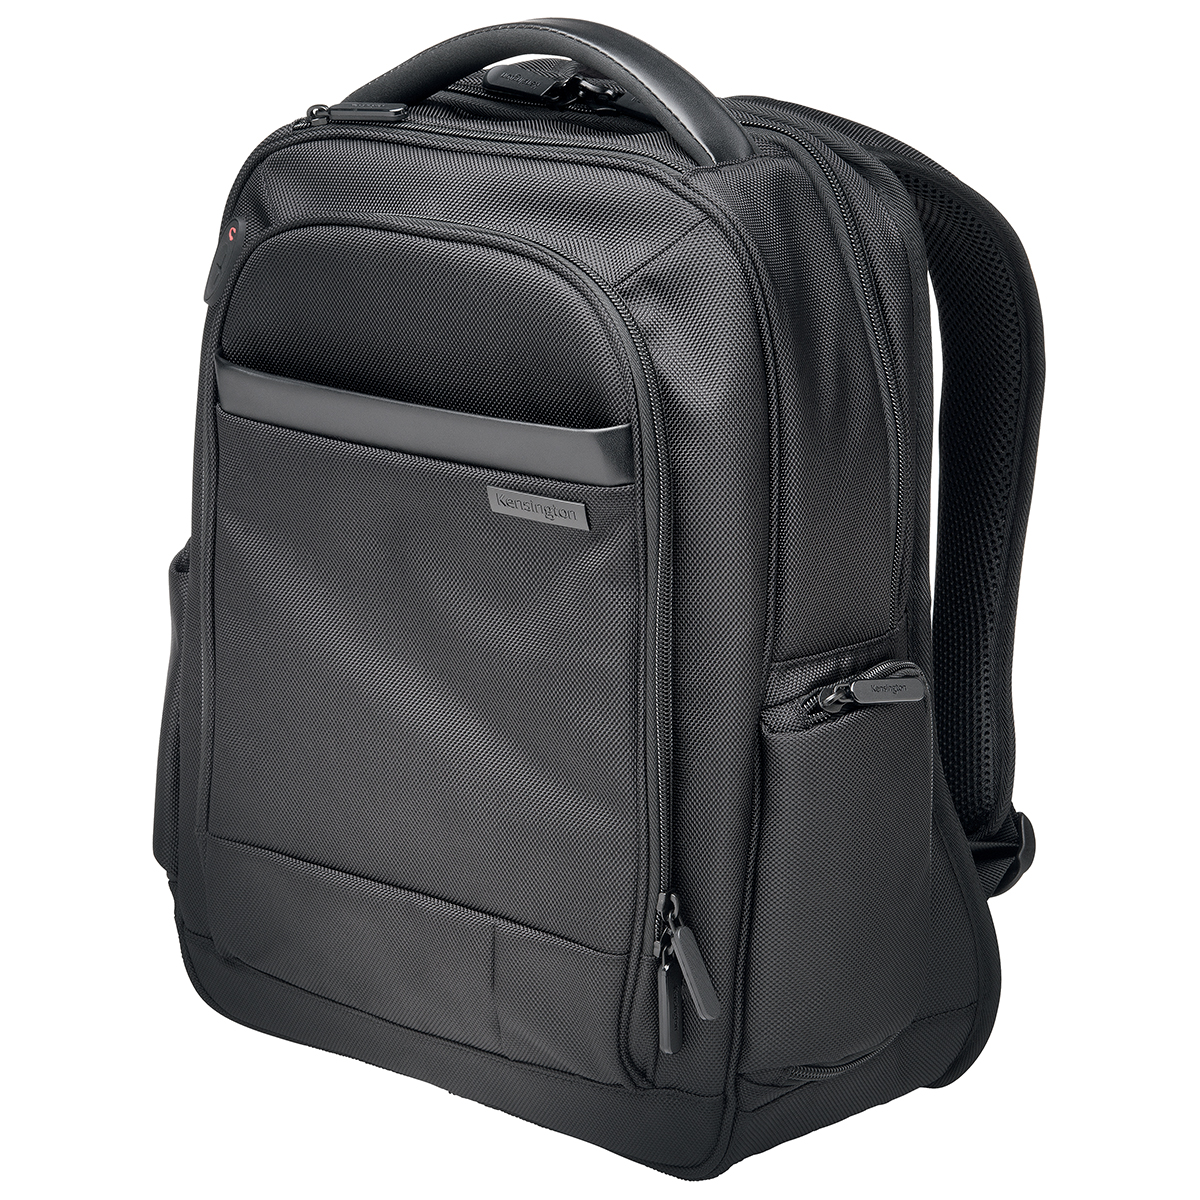 Kensington  K60383EU Contour 2.0 14 Inch Backpack